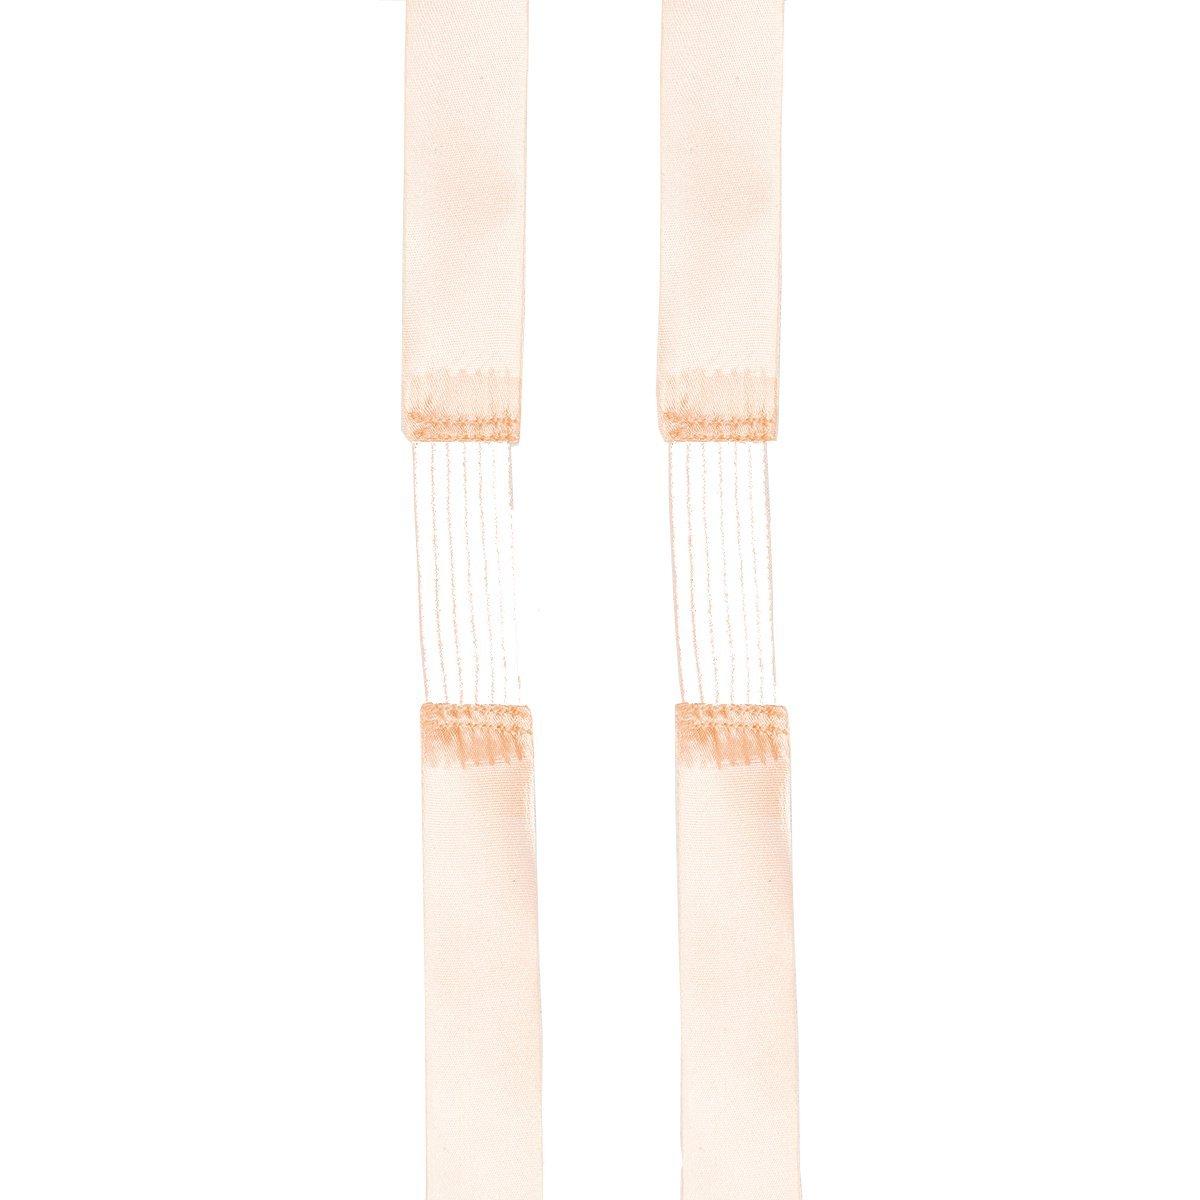 Sodanca Set Of Satin Ribbons